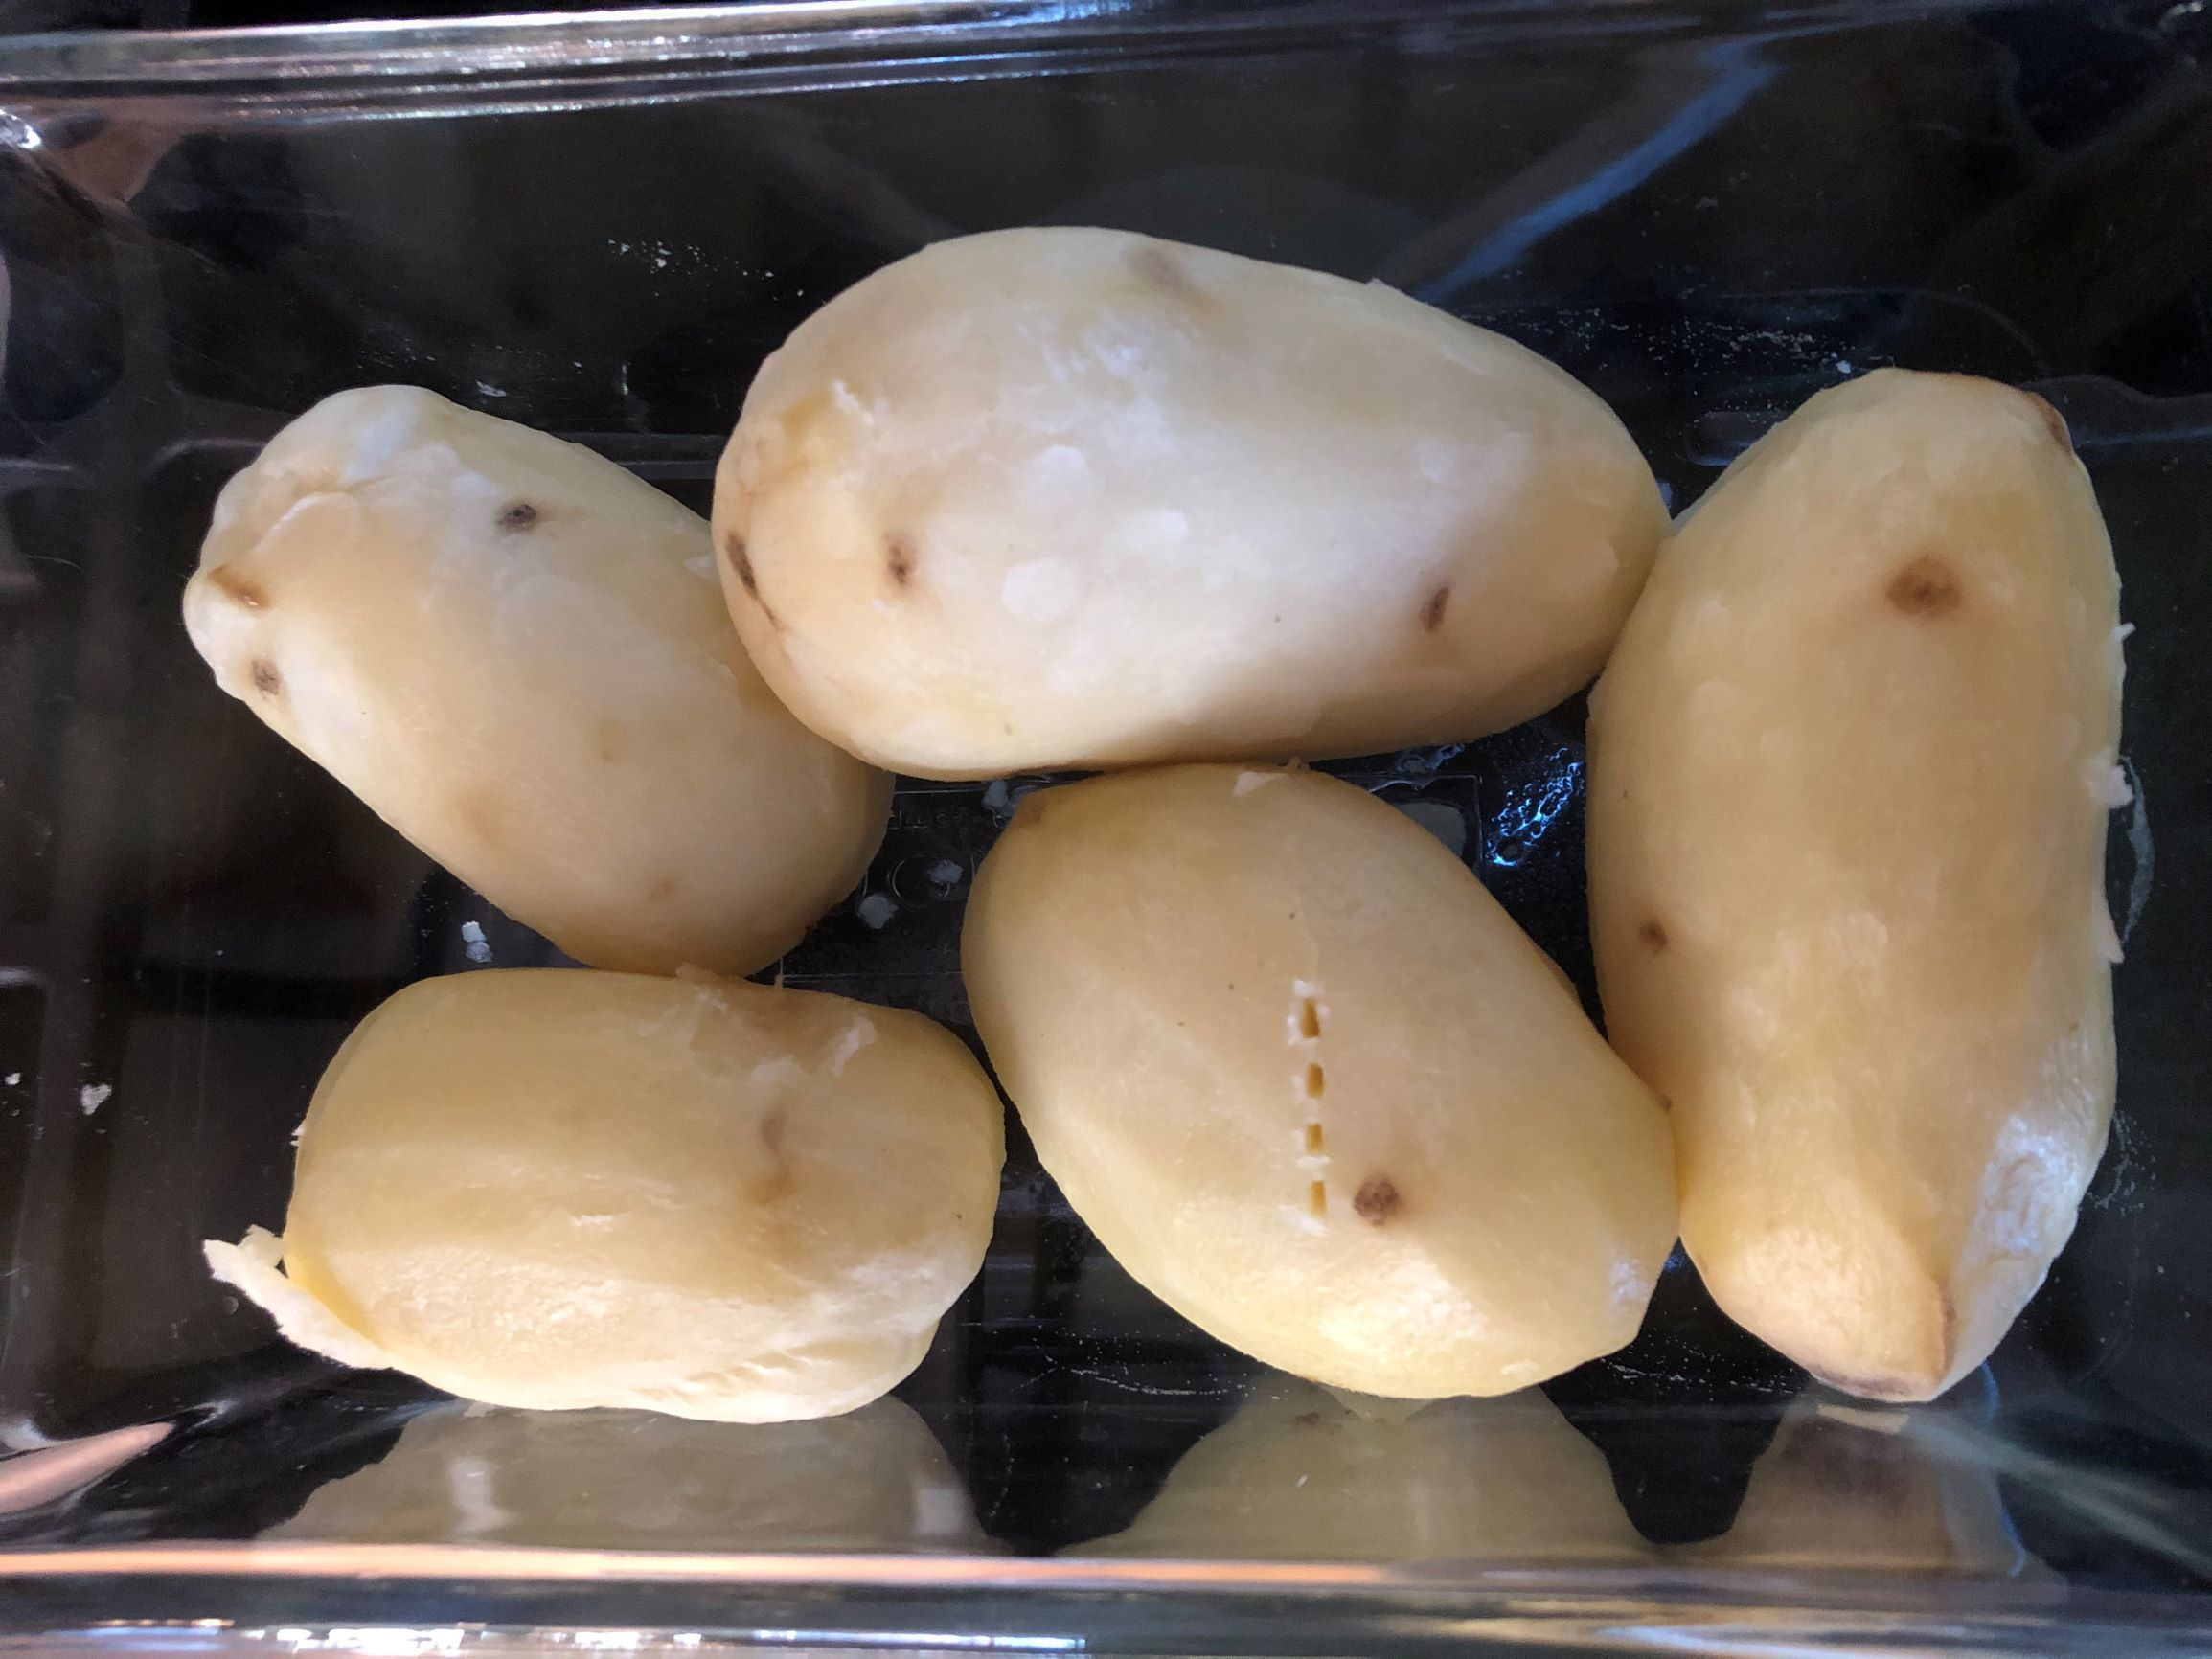 Gnocchi - Cooked Potato